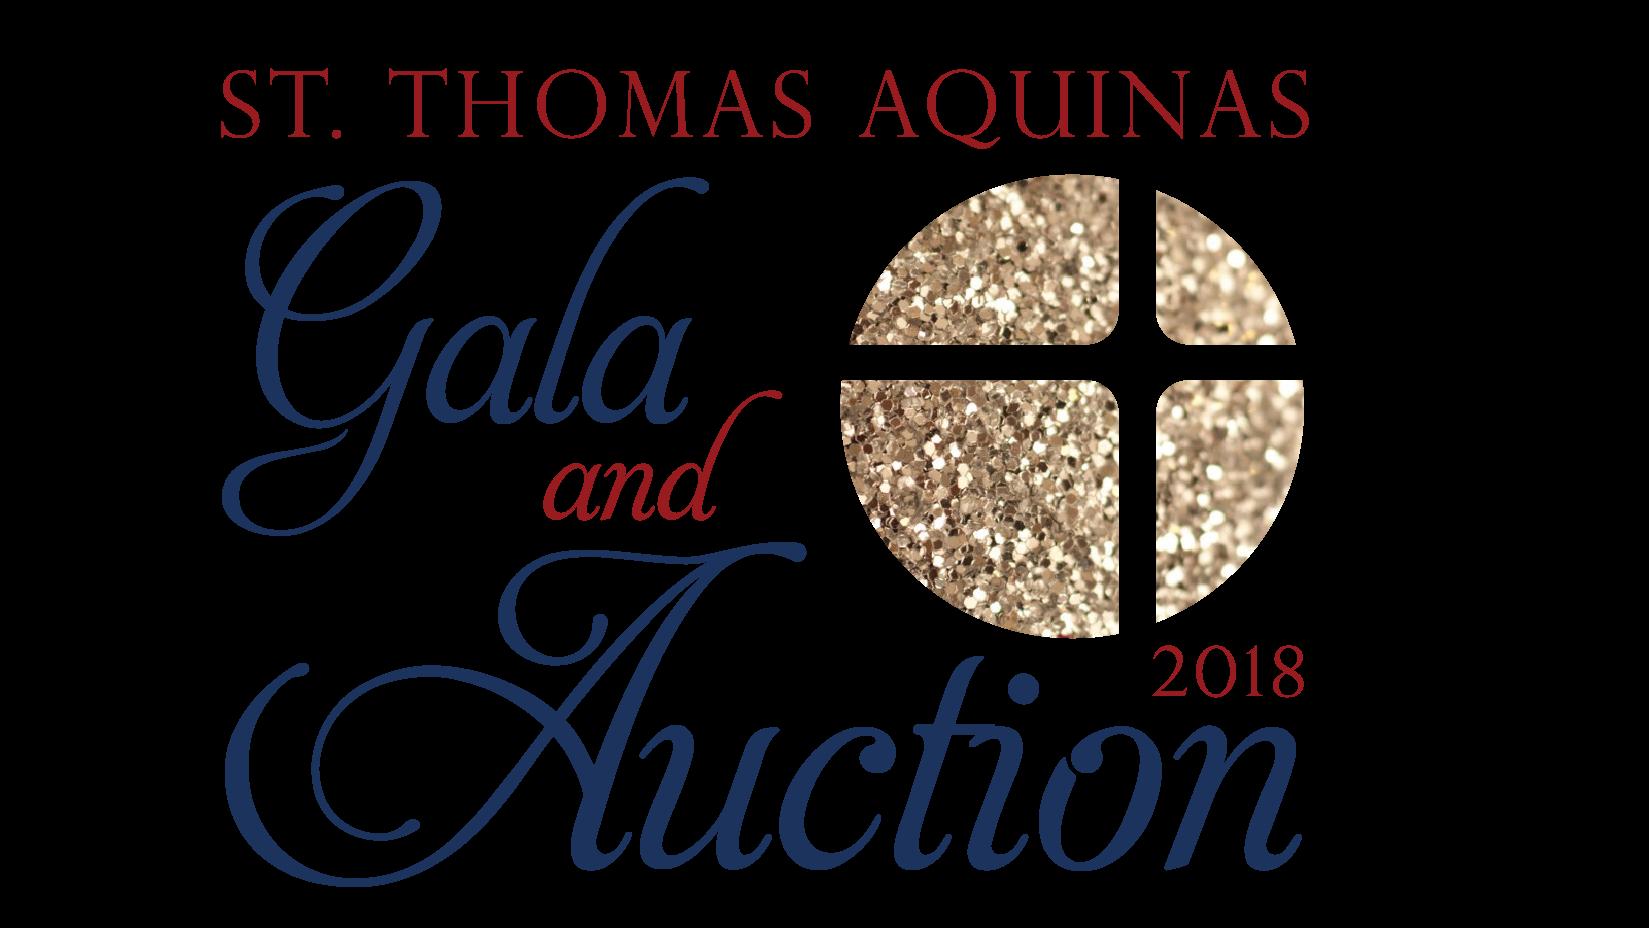 2018 Sta Gala And Auction St Thomas Aquinas Parish